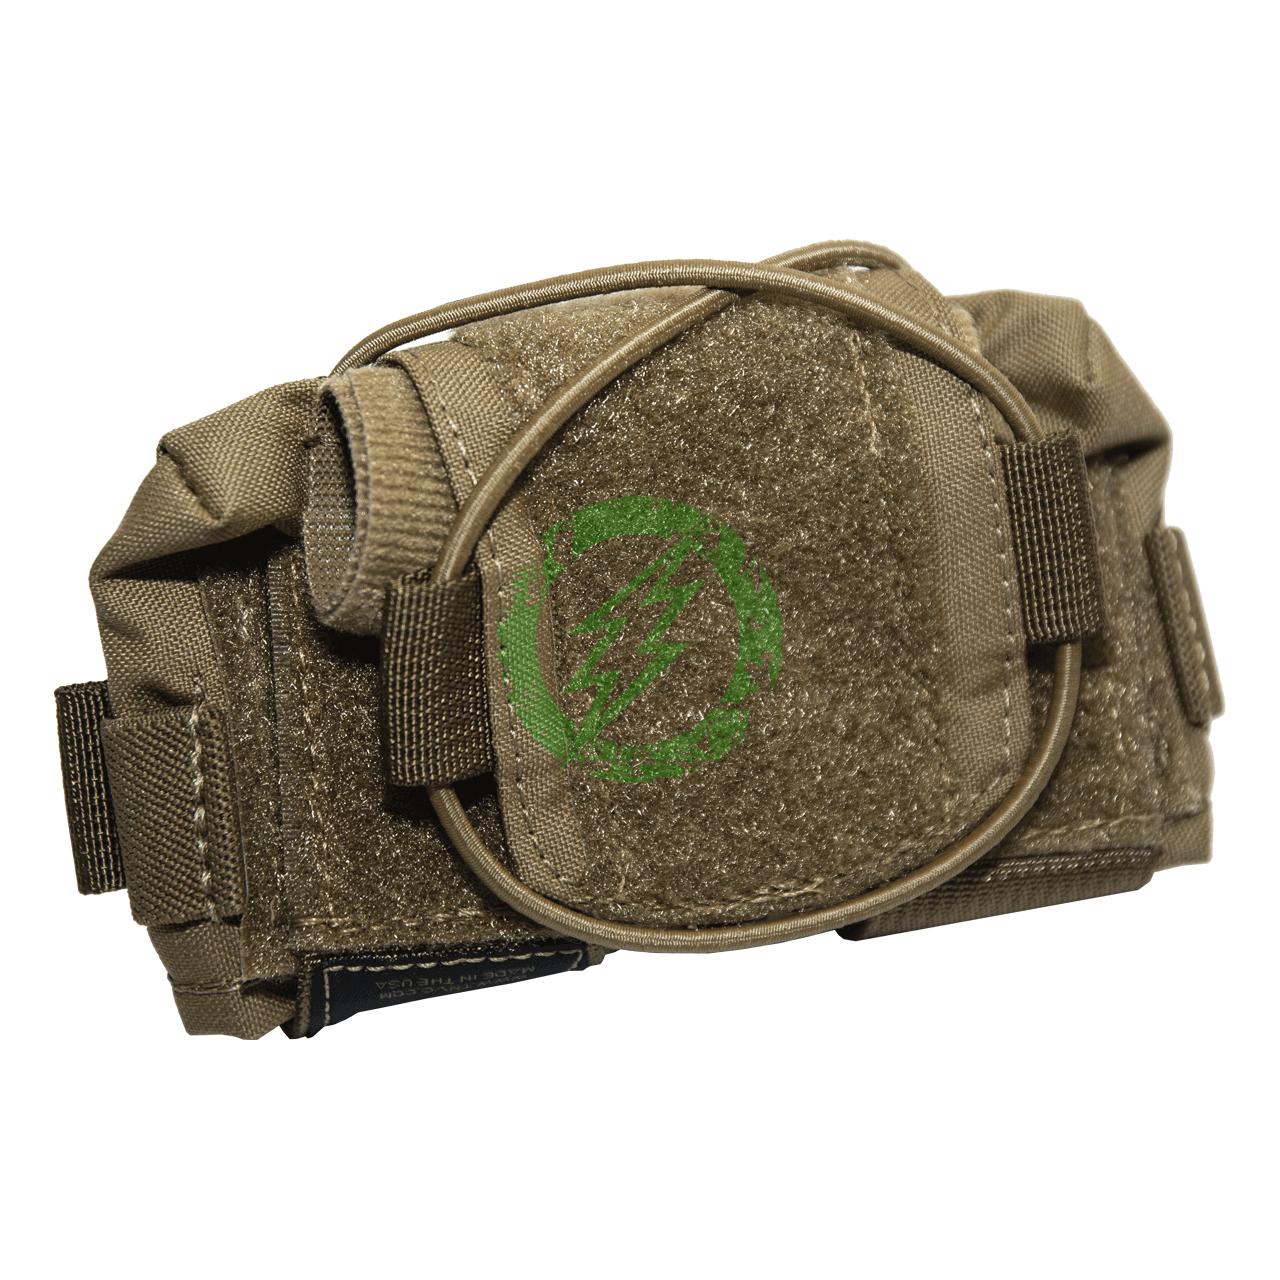 TNVC Mohawk Helmet Counterweight System MK2 Gen 2 Coyote Tan 2